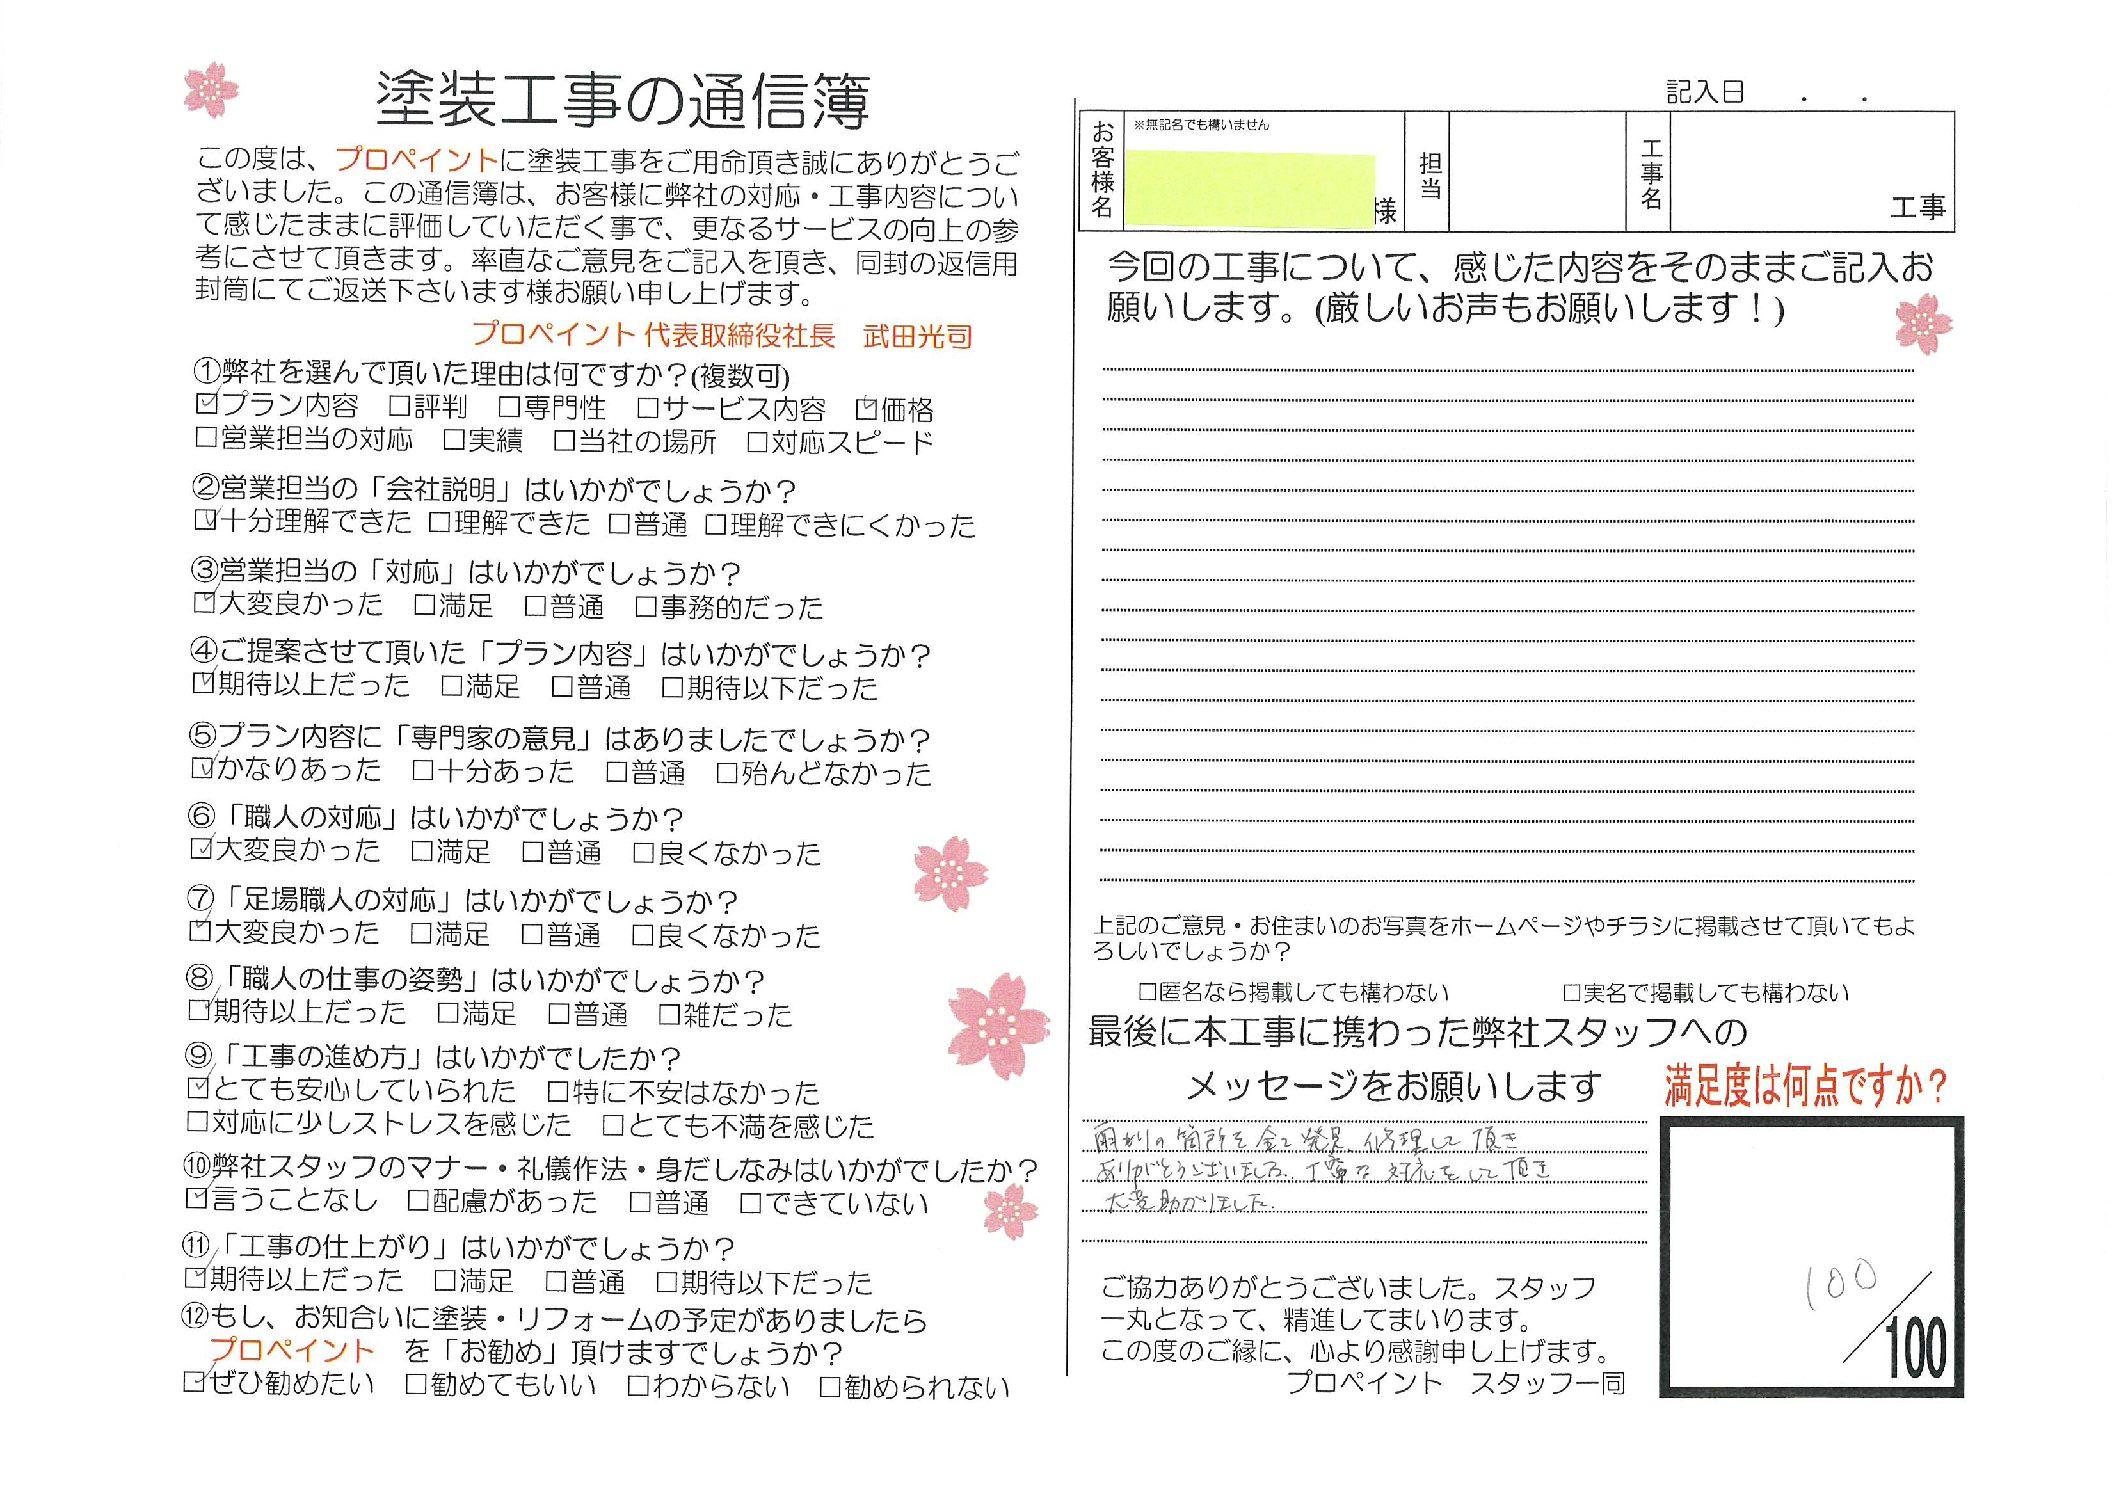 埼玉県川口市/漏水に伴う防水工事 株式会社F本社